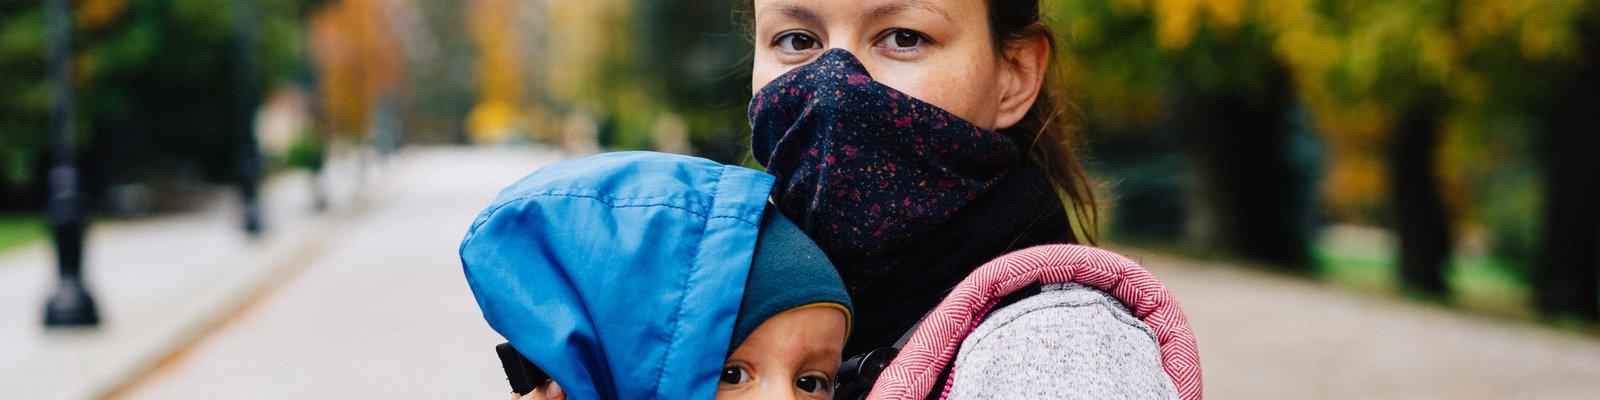 woman holding baby.jpg